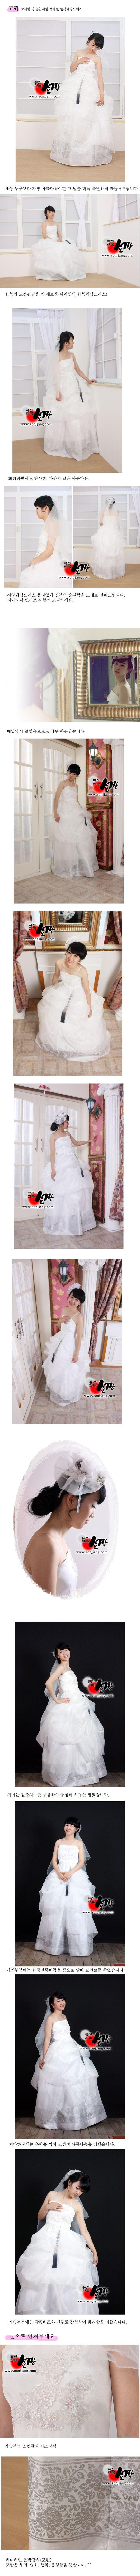 HANBOK - korean clothes,korean wedding dresses,modern hanbok,traditional costume,fusion hanbok,reception dresses